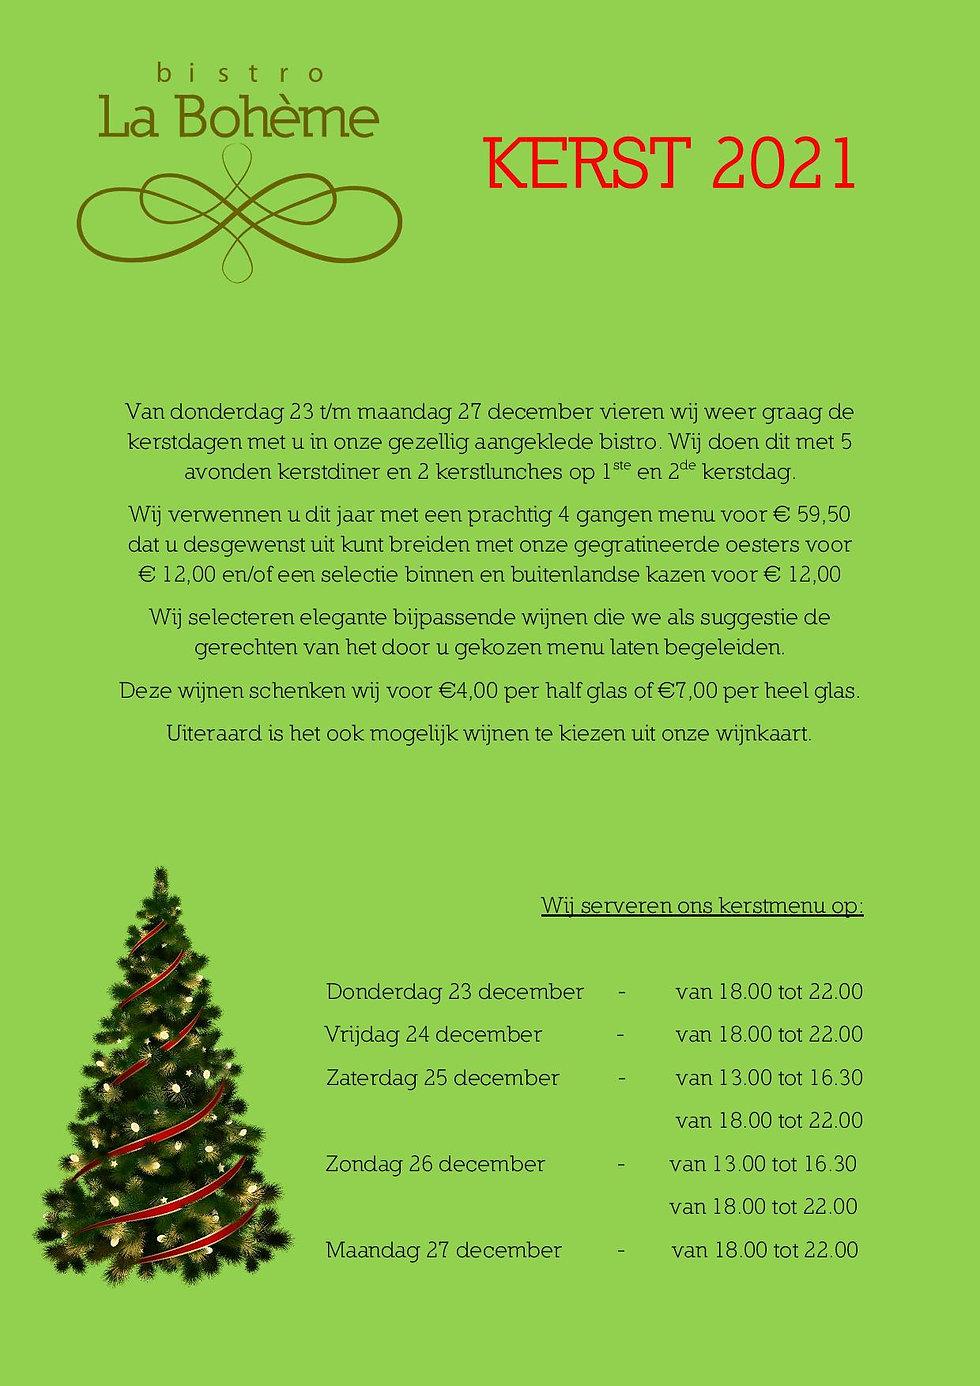 Kerst 2021-page-001.jpg